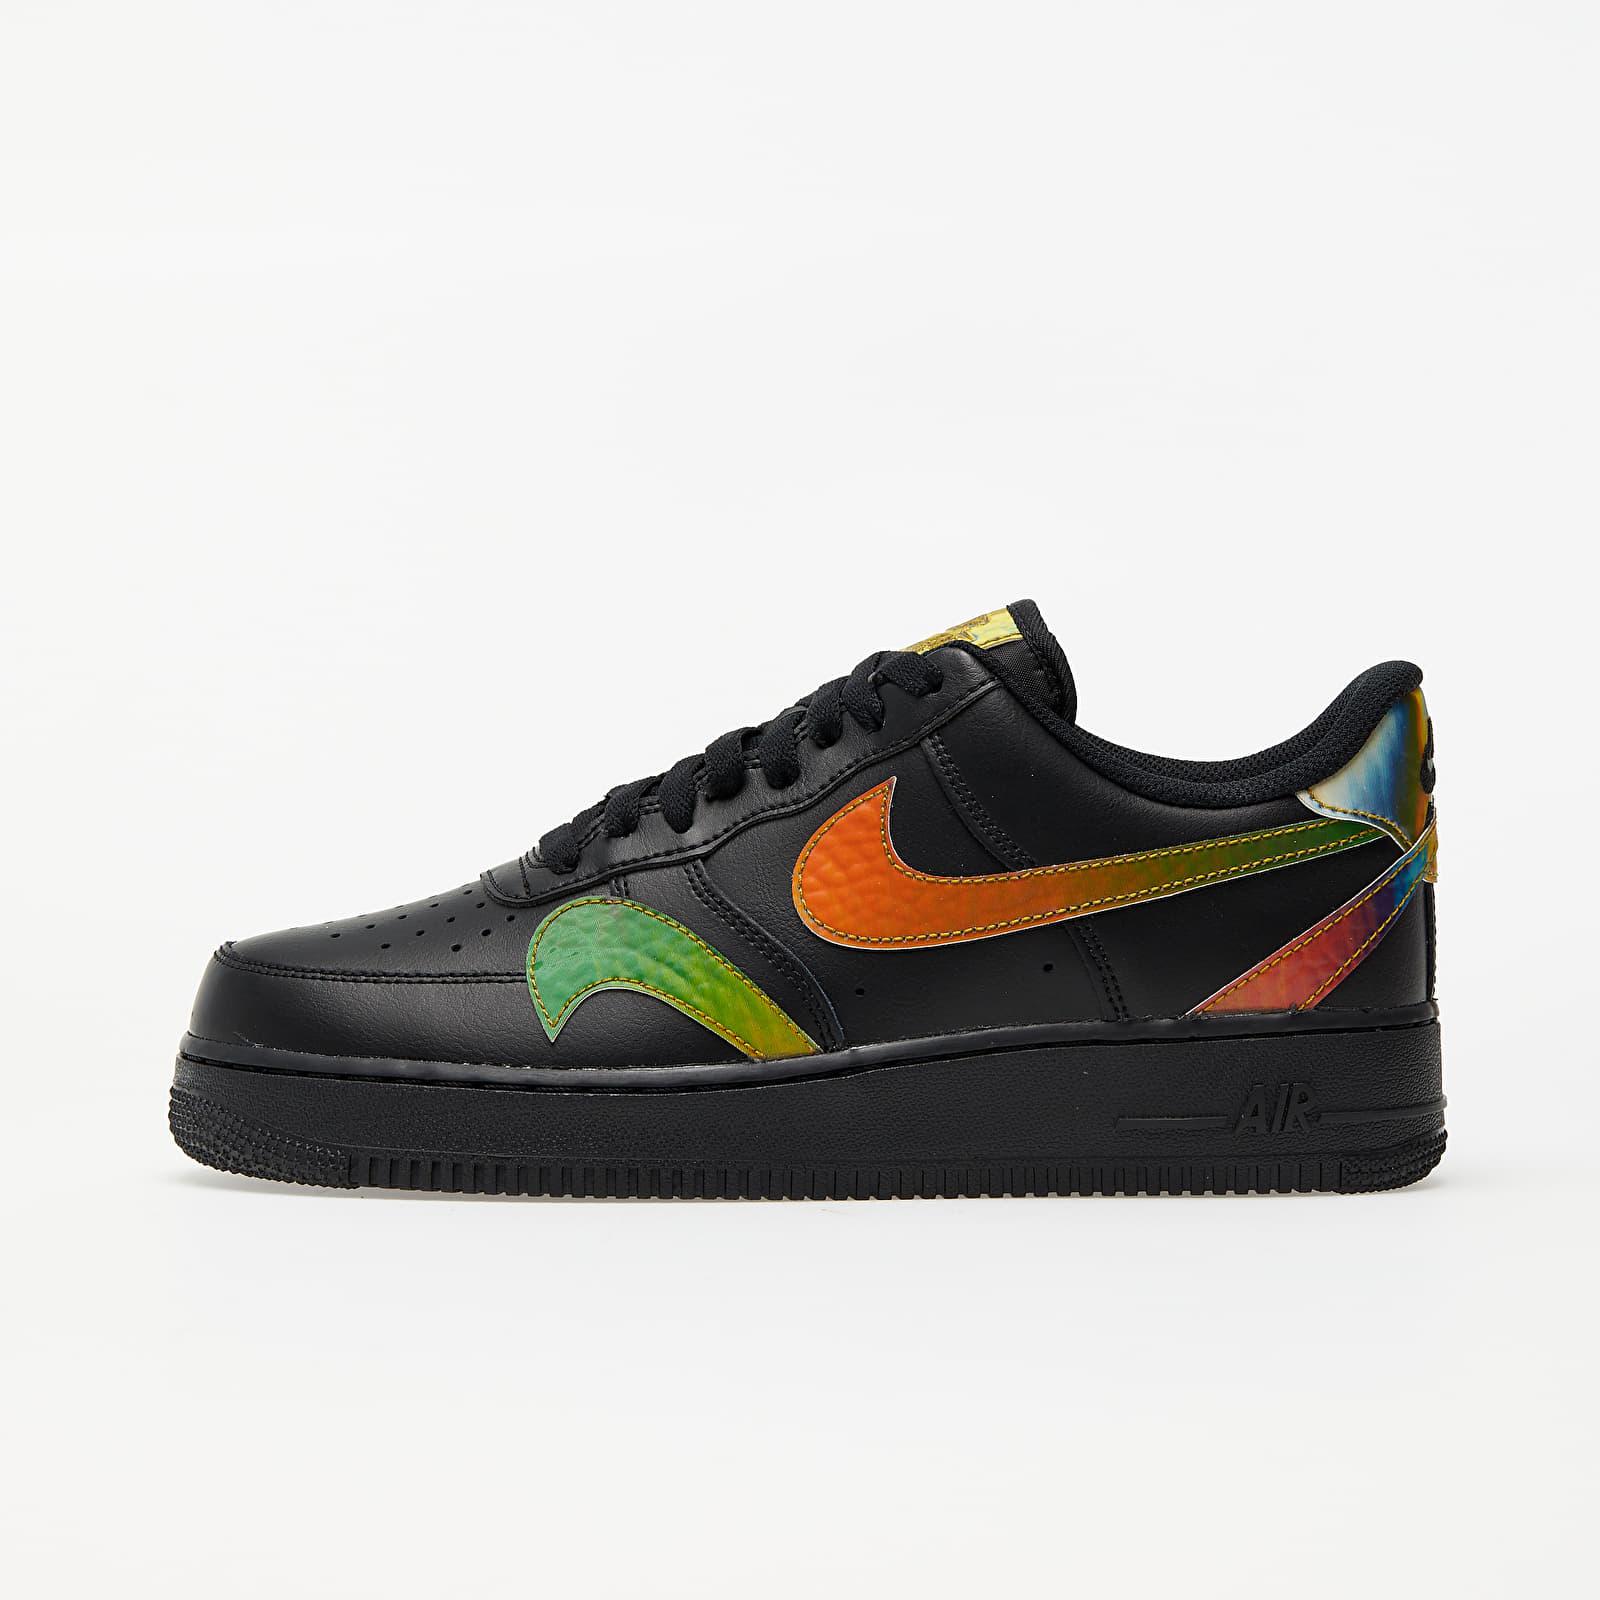 Scarpe e sneaker da uomo Nike Air Force 1 '07 LV8 Black/ Multi-Color-Black